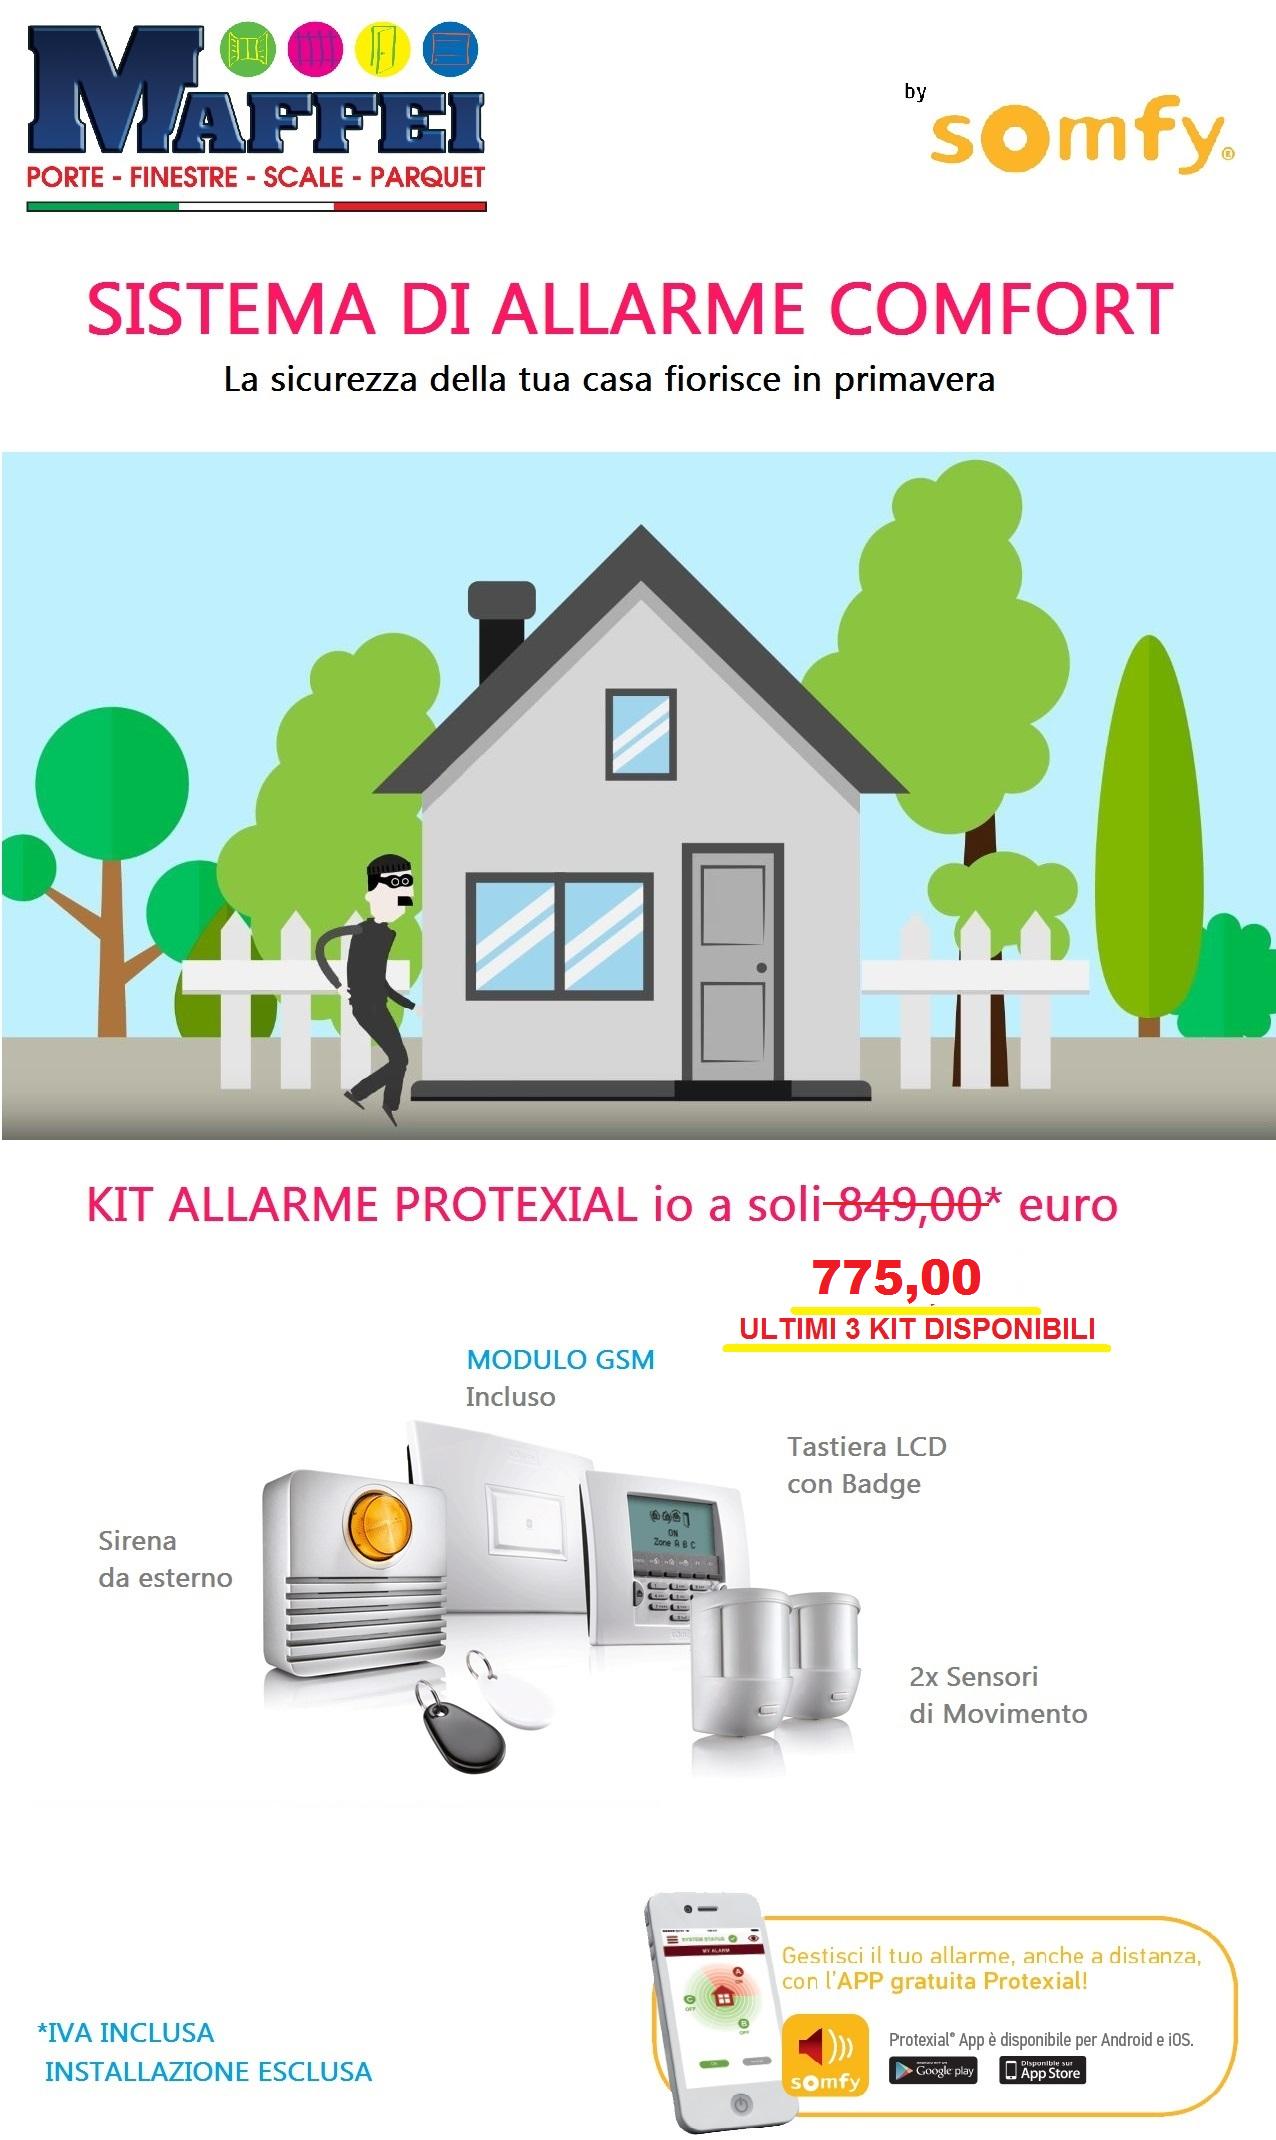 Offerta sistema di allarme somfy mod protexial maffei for Sistema allarme casa